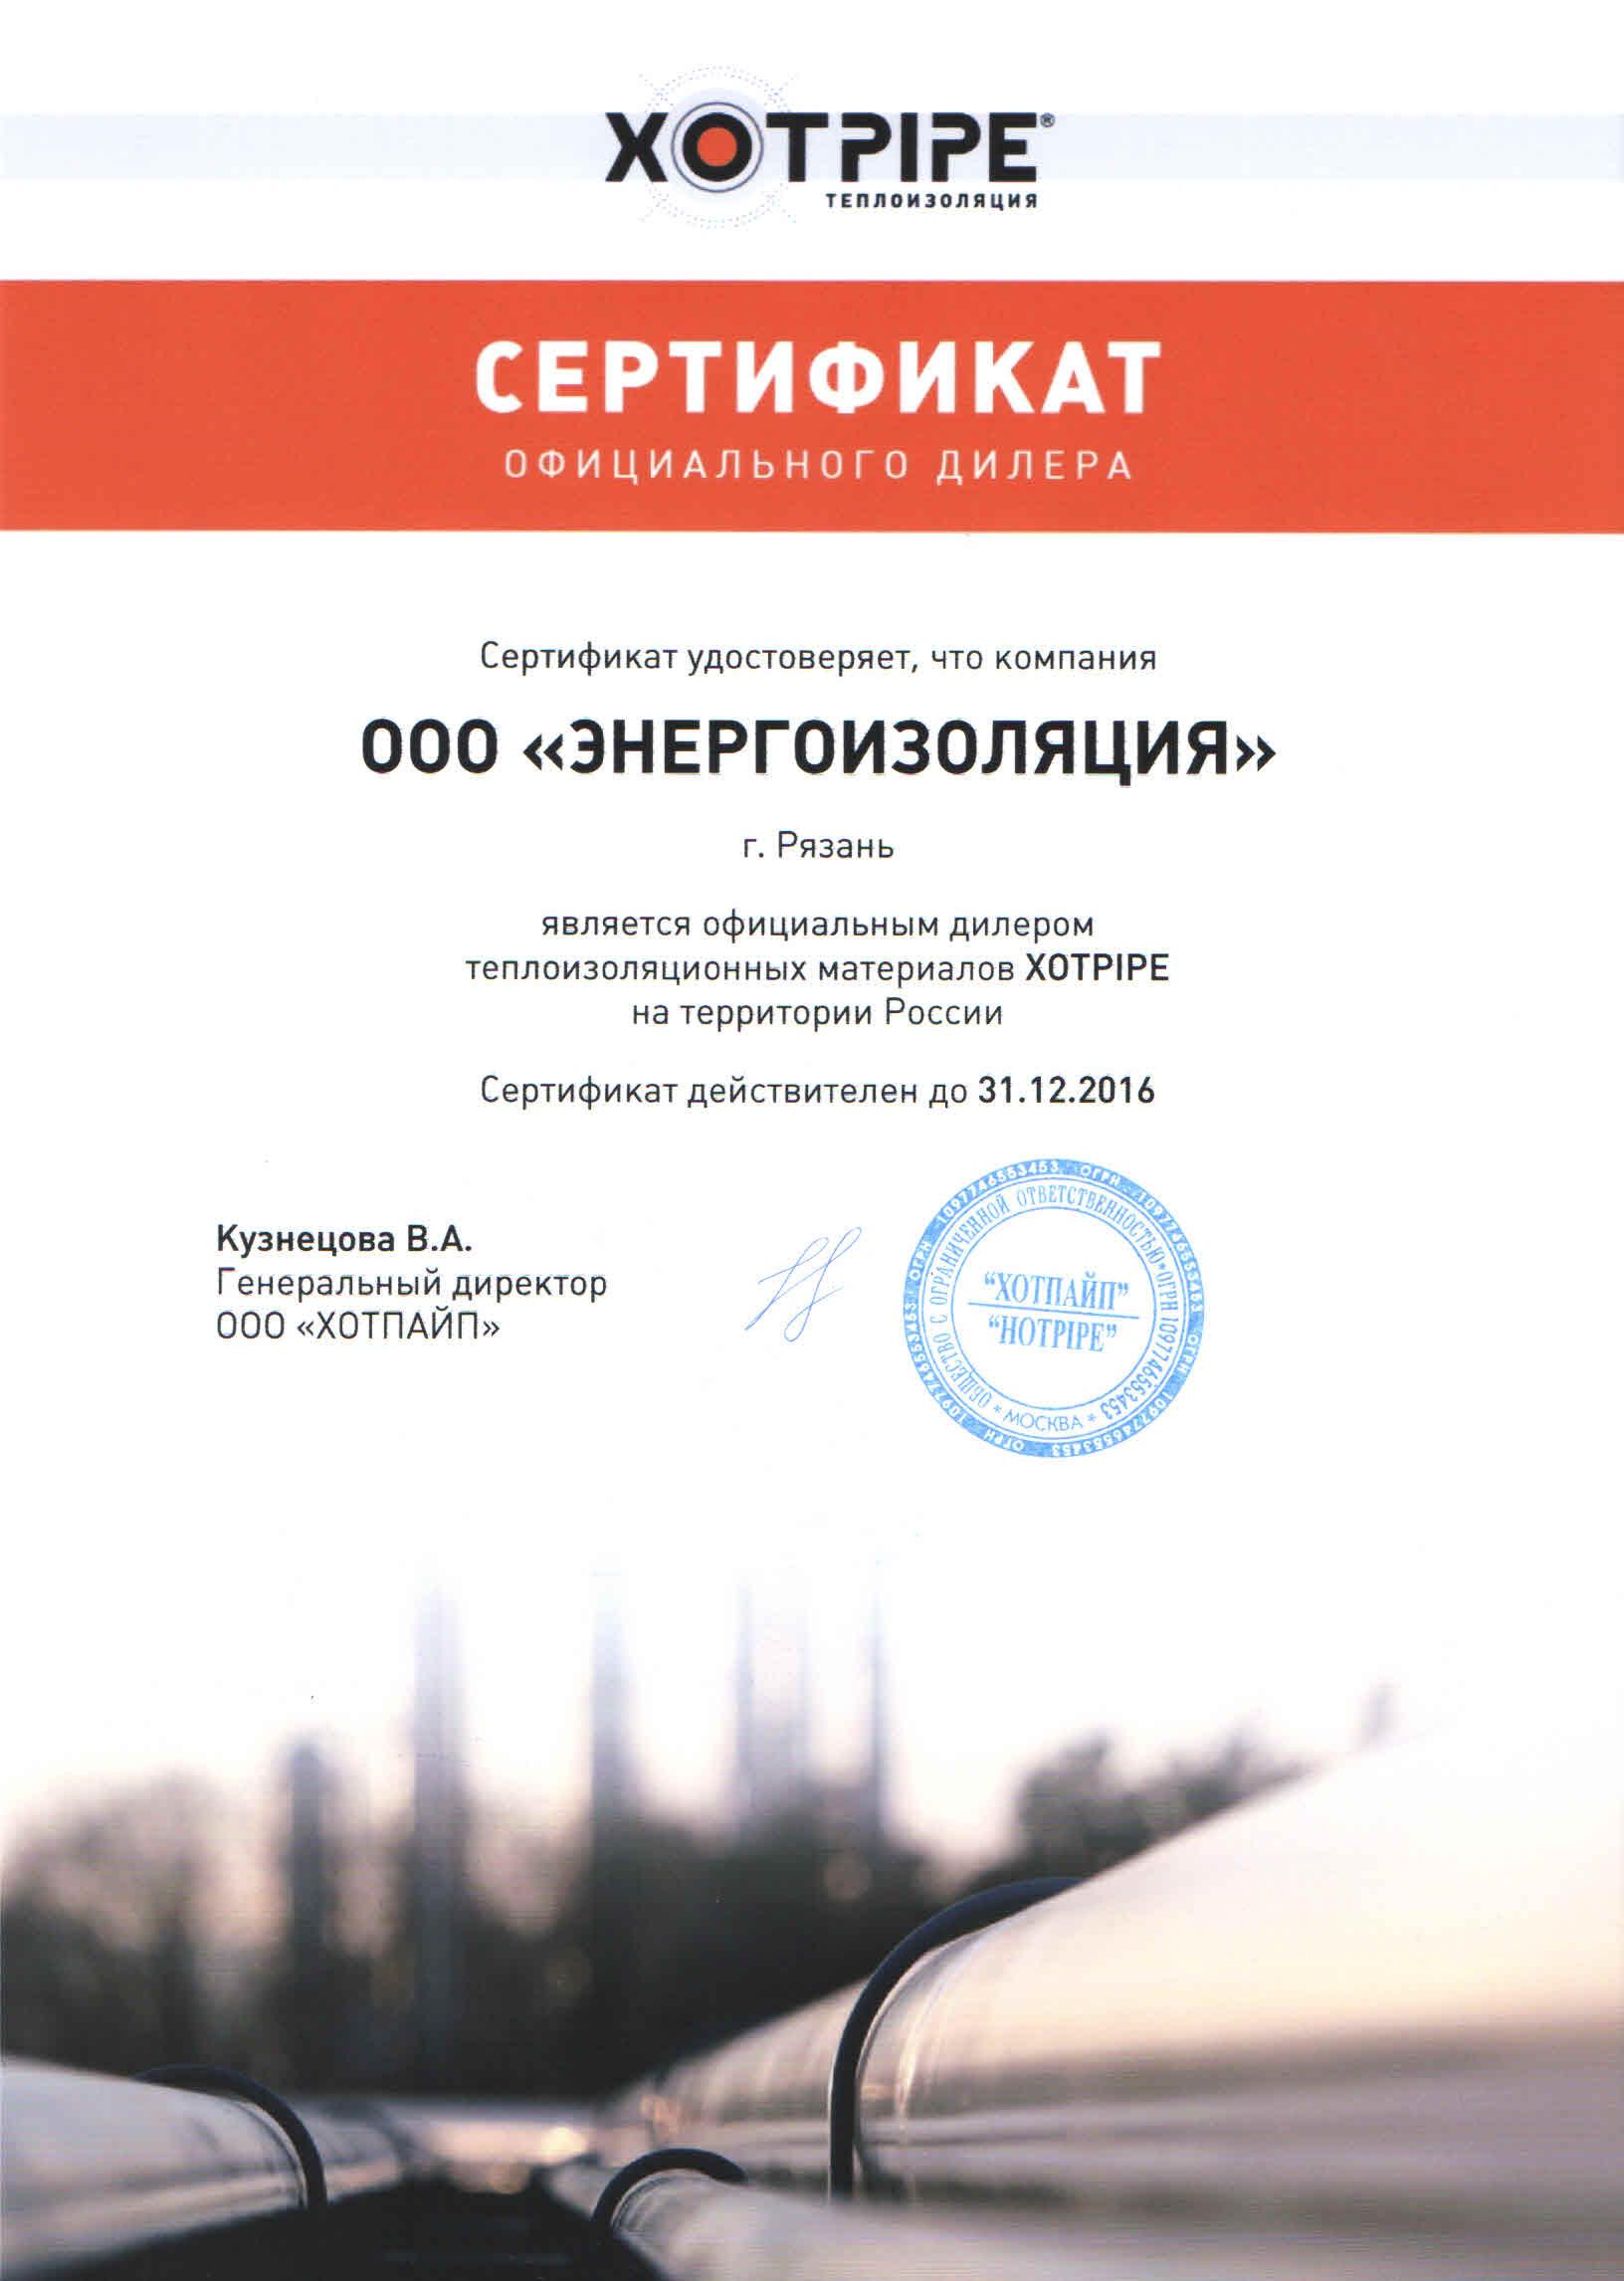 Сертификат дилера ХОТПАЙП - ЭнергоИзоляция